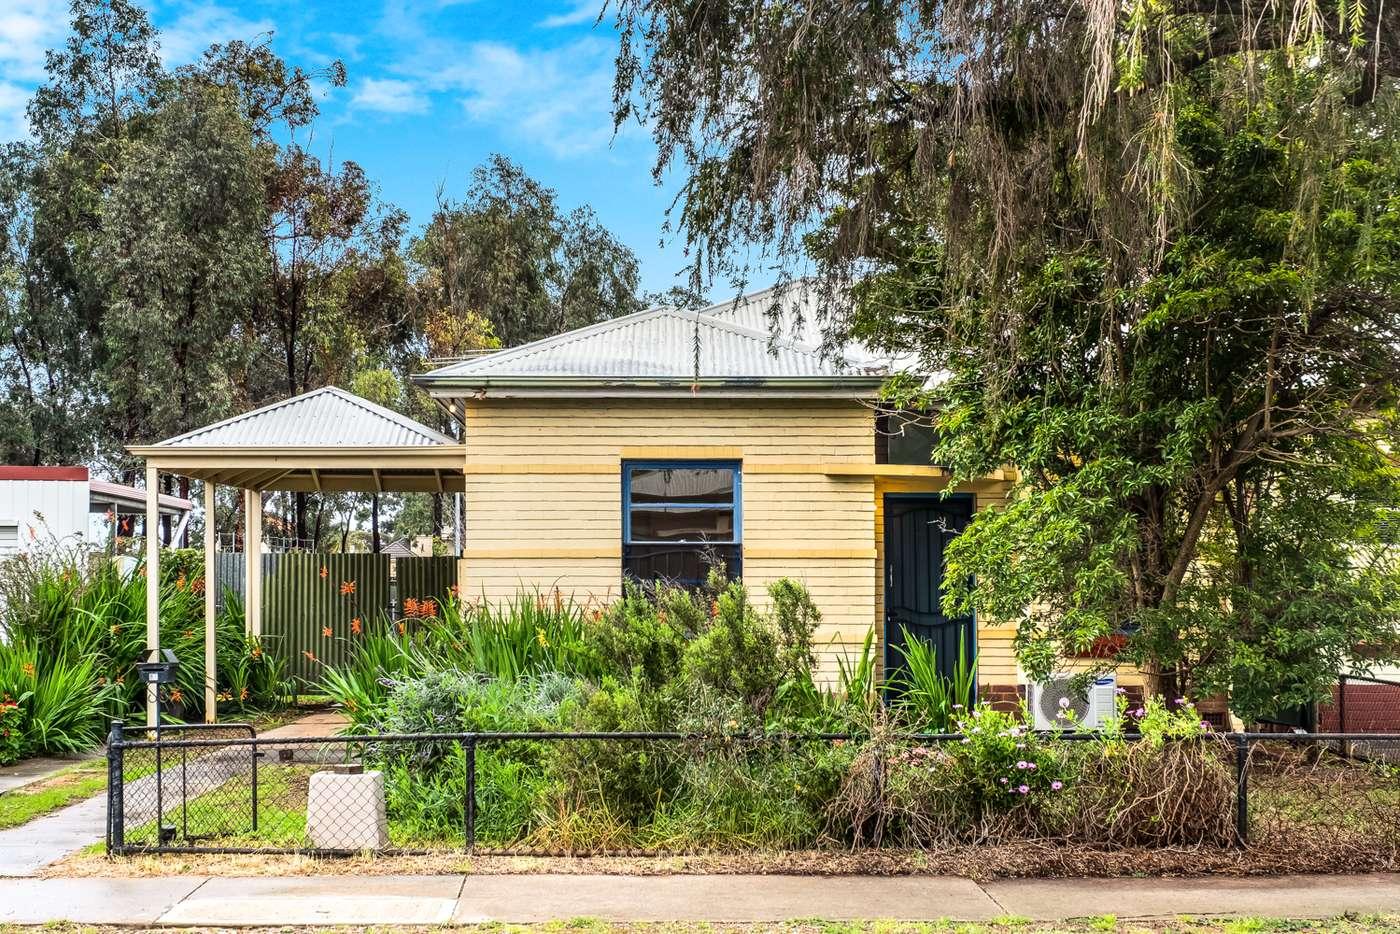 Main view of Homely house listing, 86 Blight Street, Ridleyton SA 5008